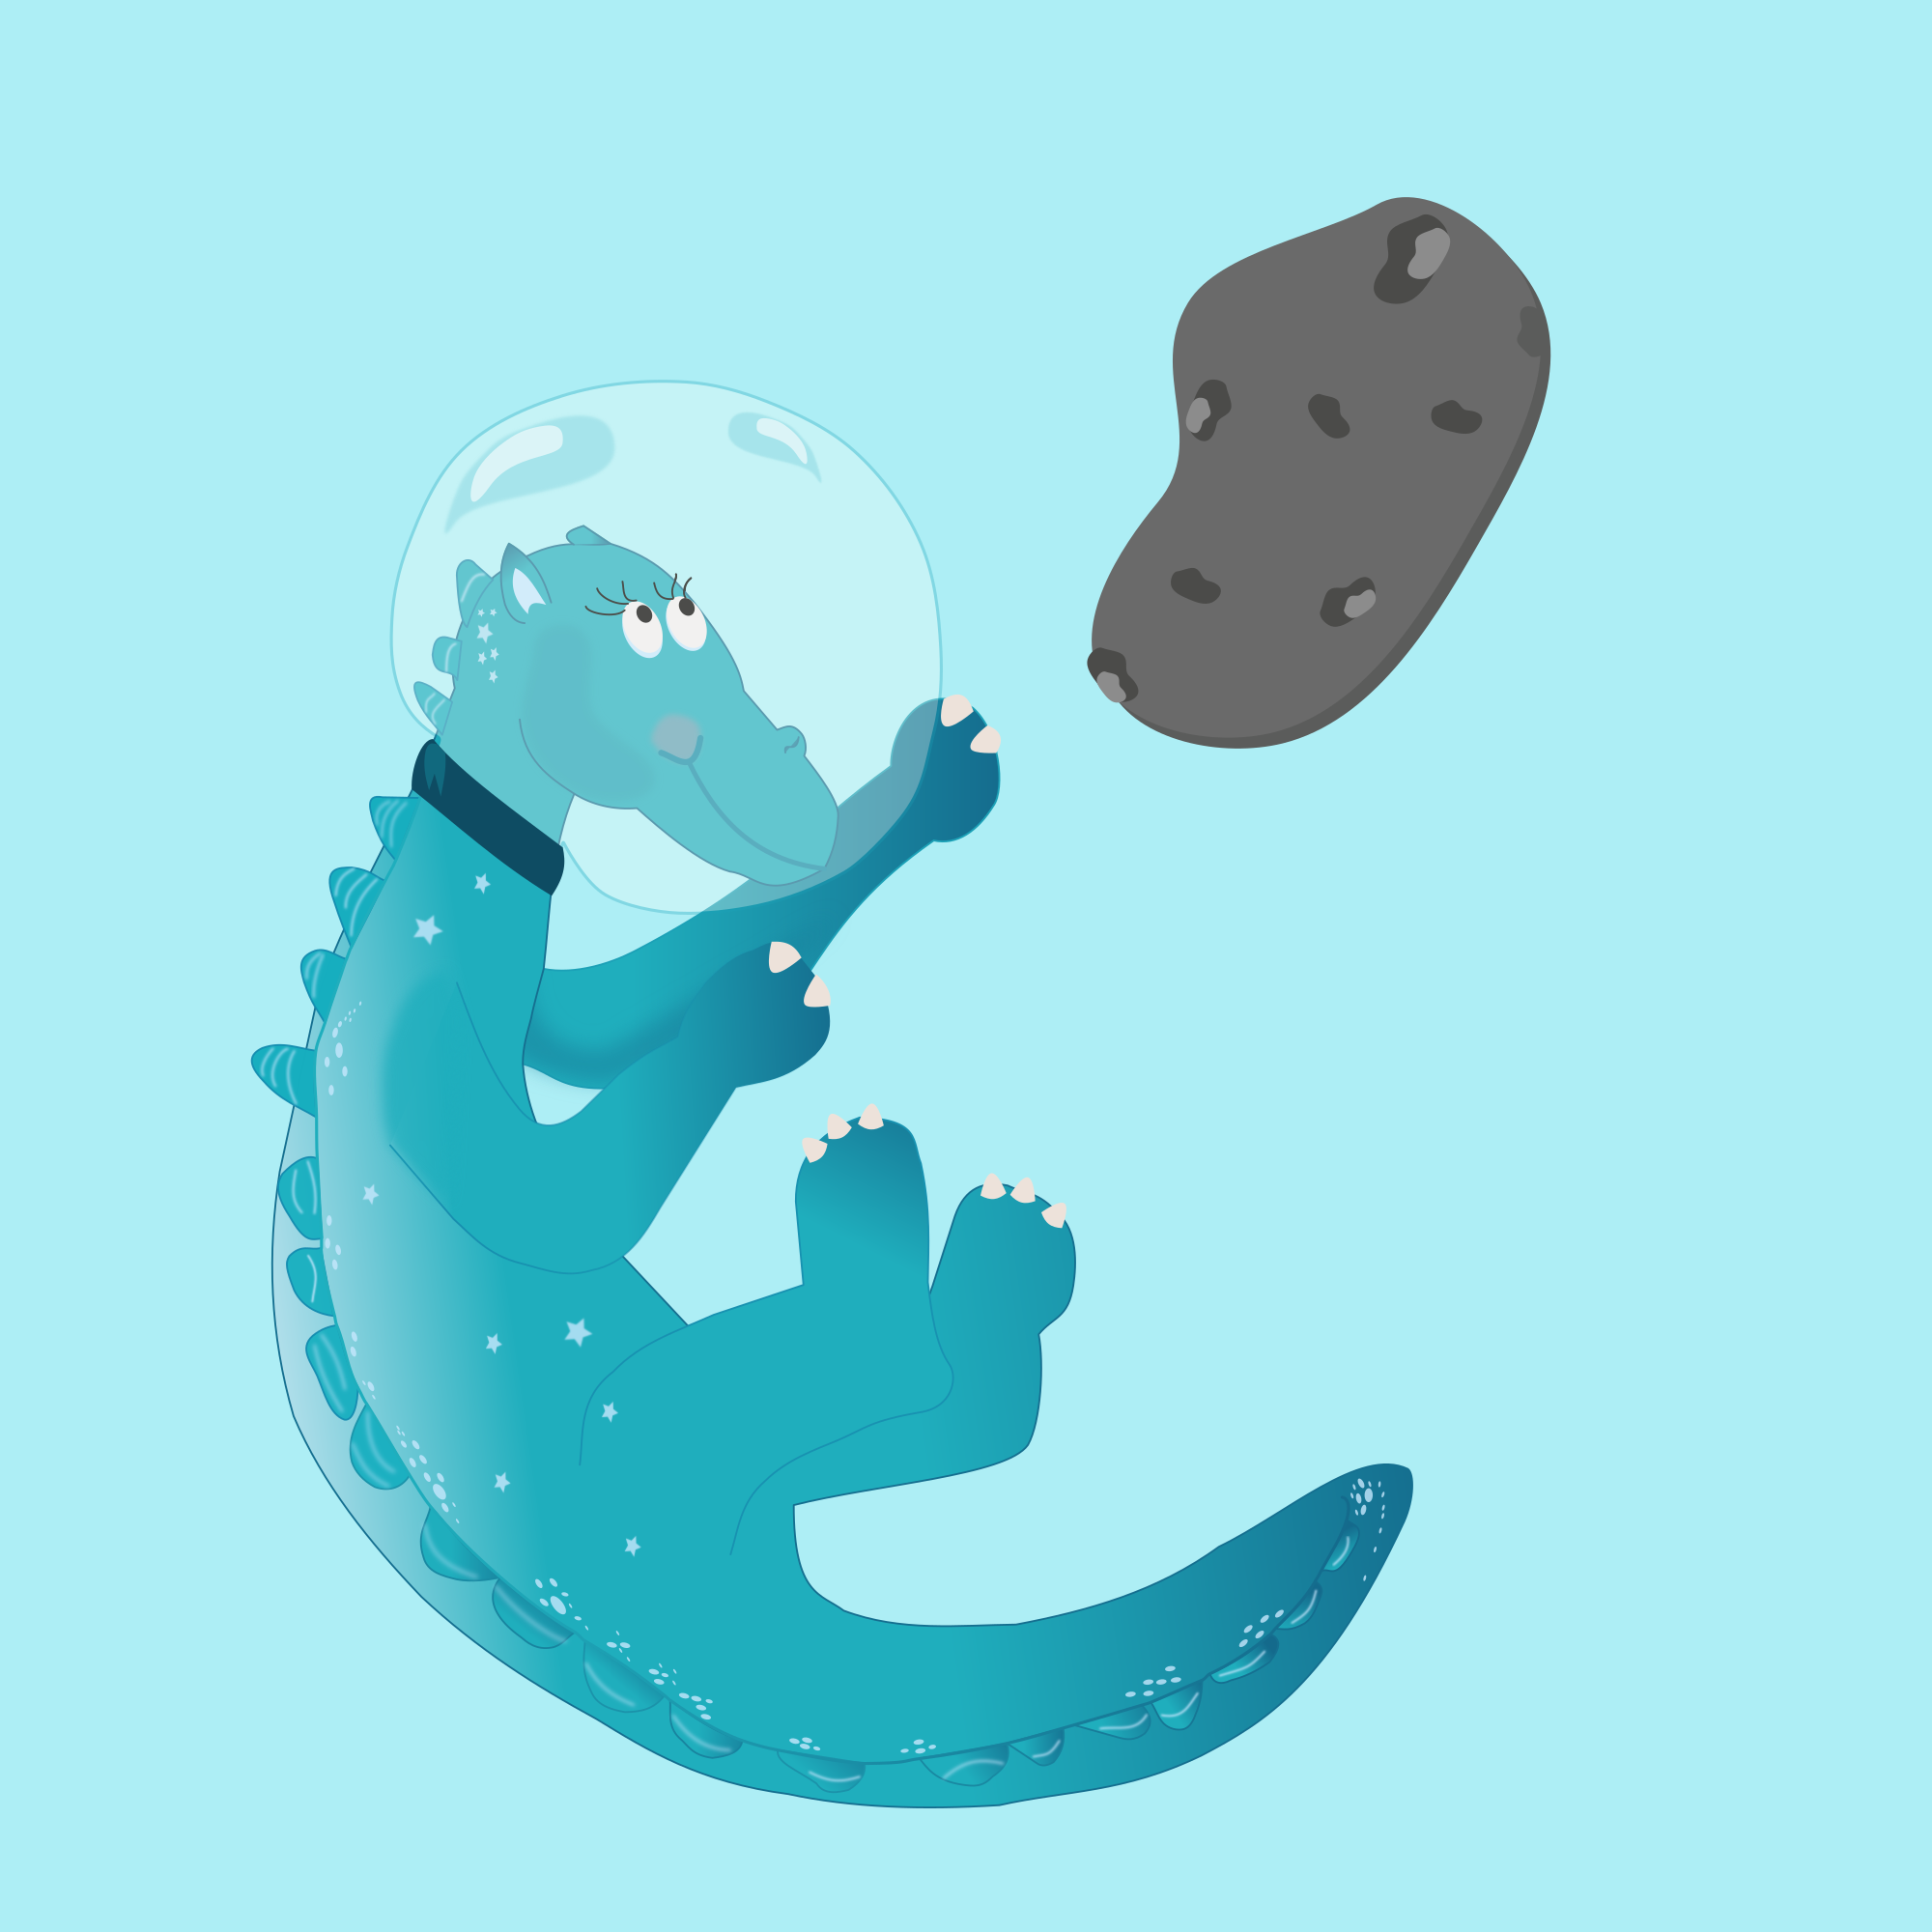 AsteroidAwarenessDay-AsteroidDayArt